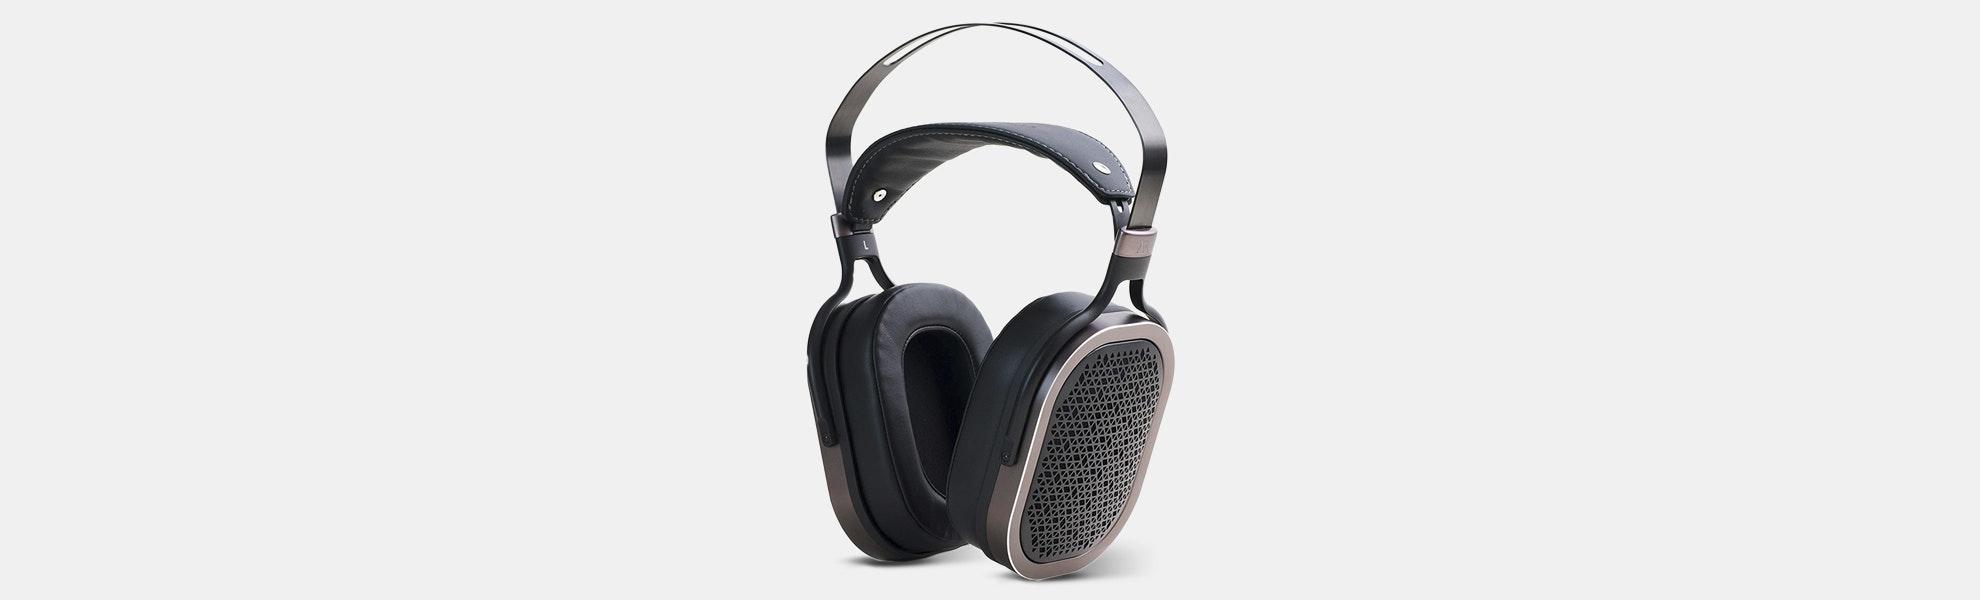 Acoustic Research AR-H1 Planar Magnetic Headphones